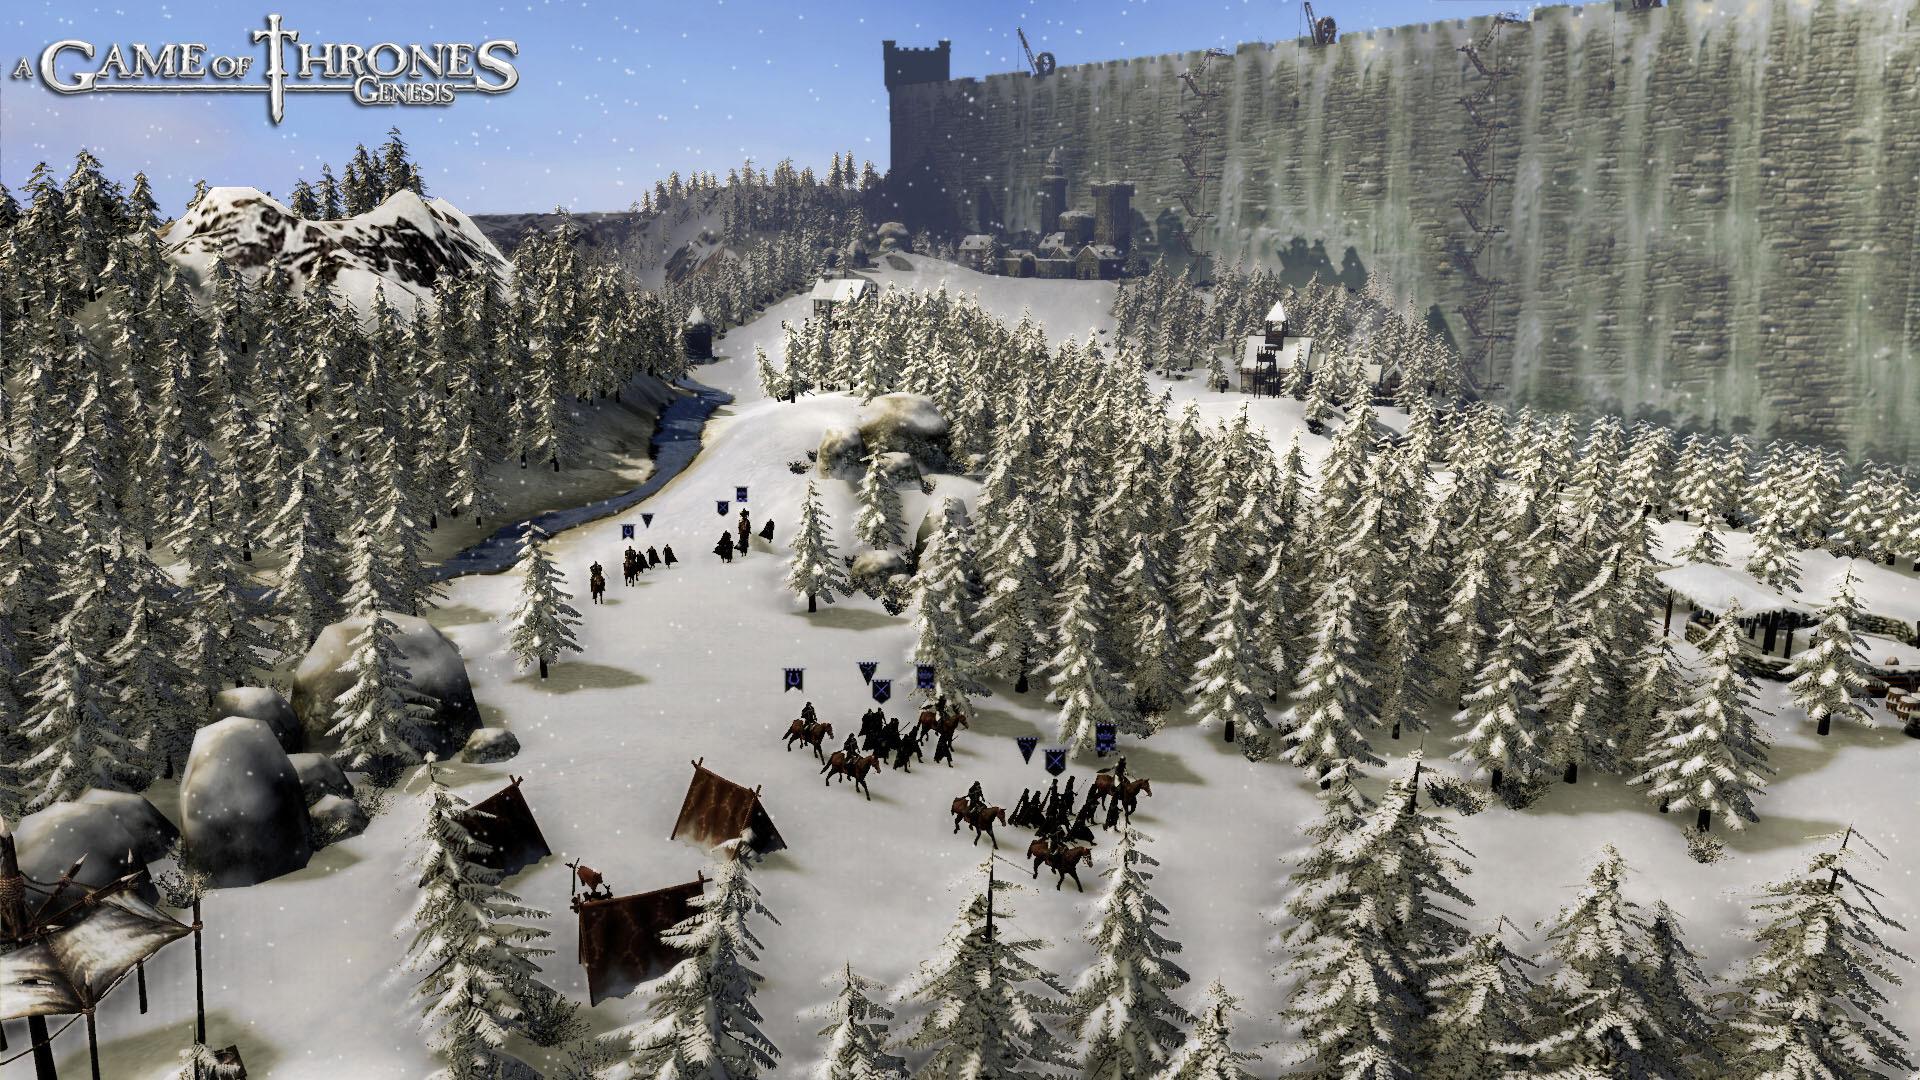 AGameofThrones-Genesis PC Editeur 003